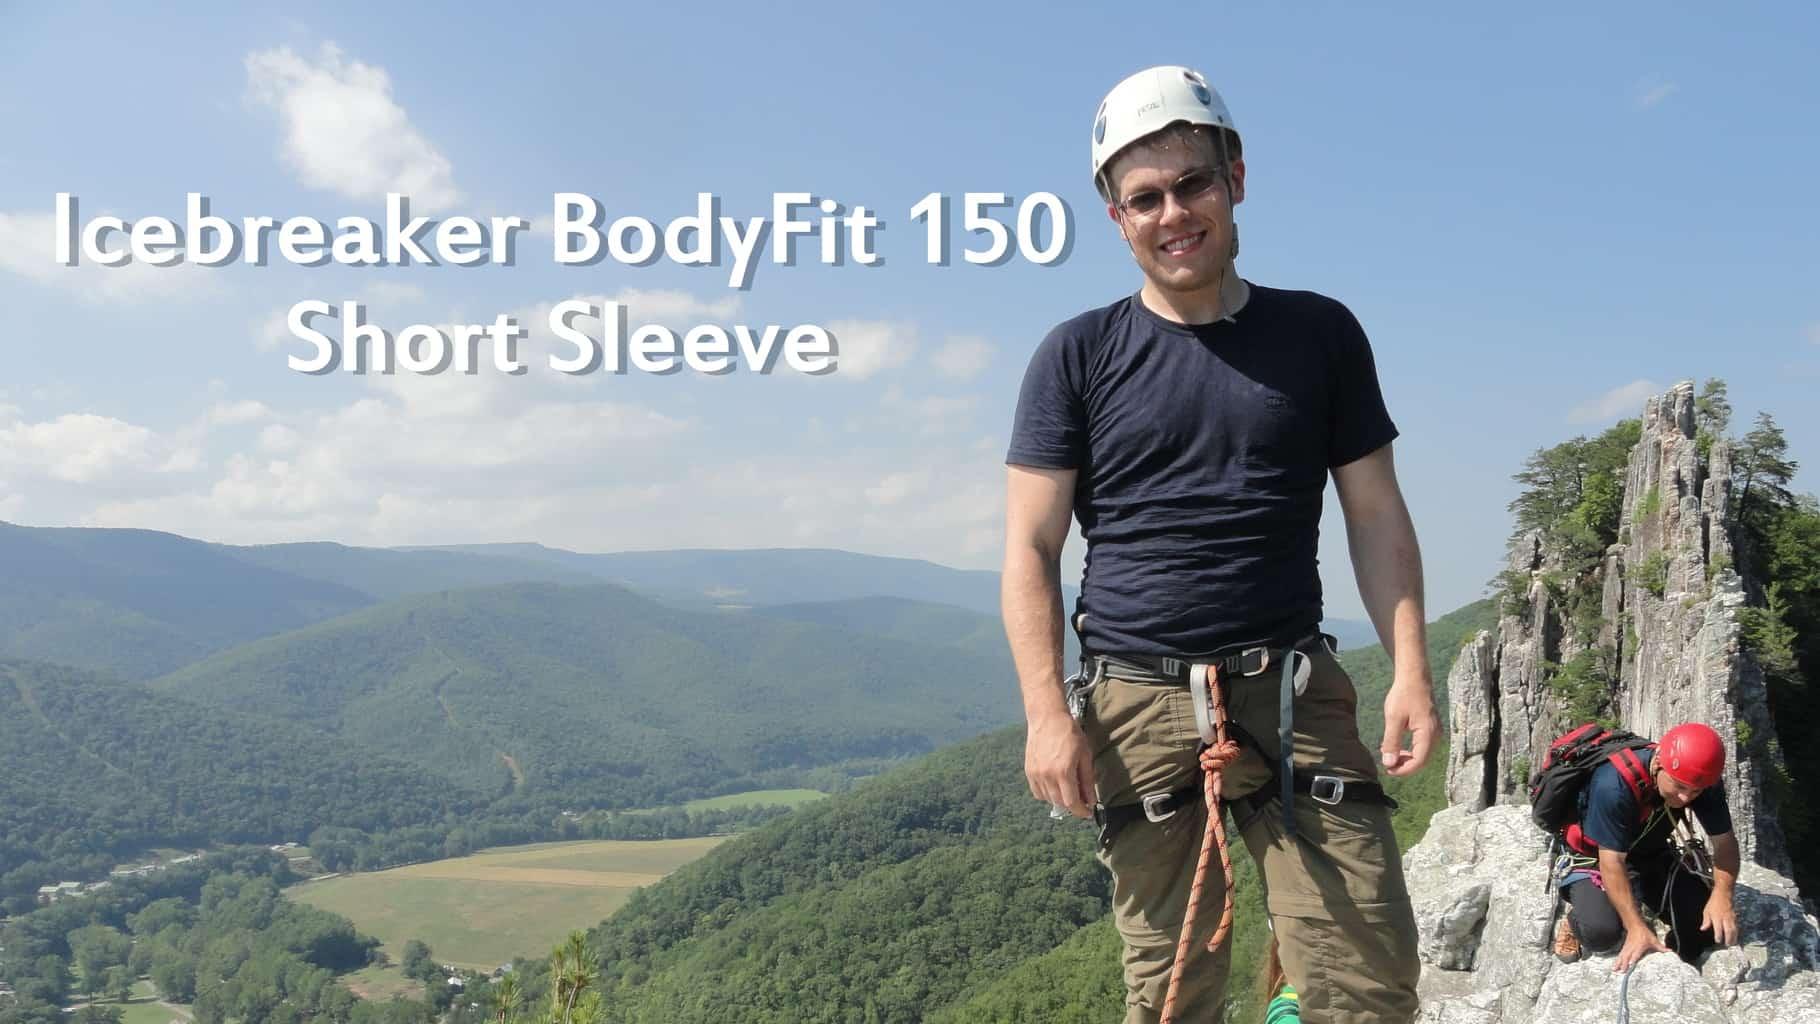 Icebreaker BodyFit 150